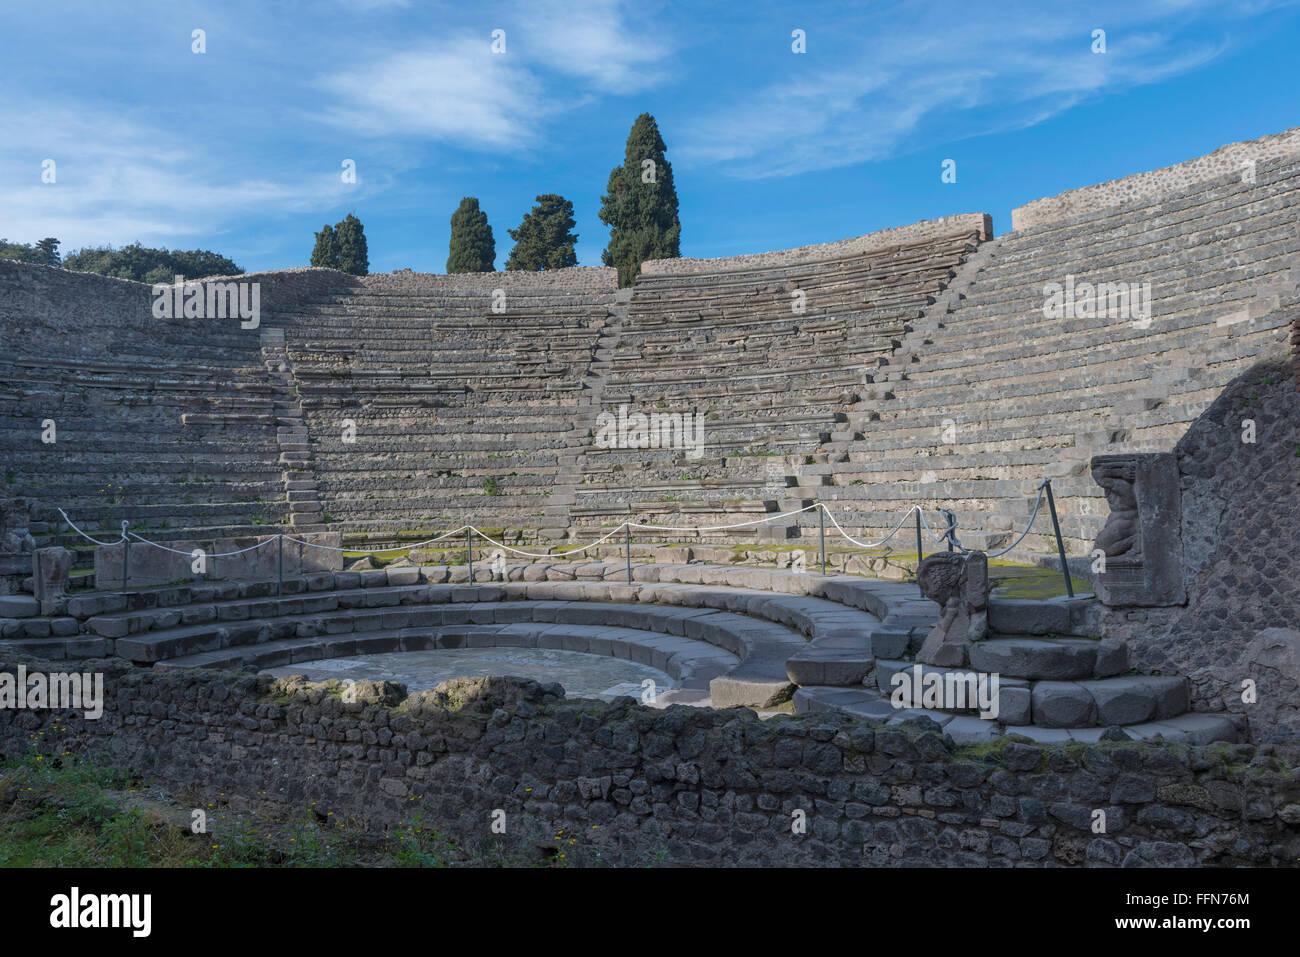 Pompeii Amphitheatre or Roman arena in the ancient city of Pompeii, Italy, Europe - Stock Image